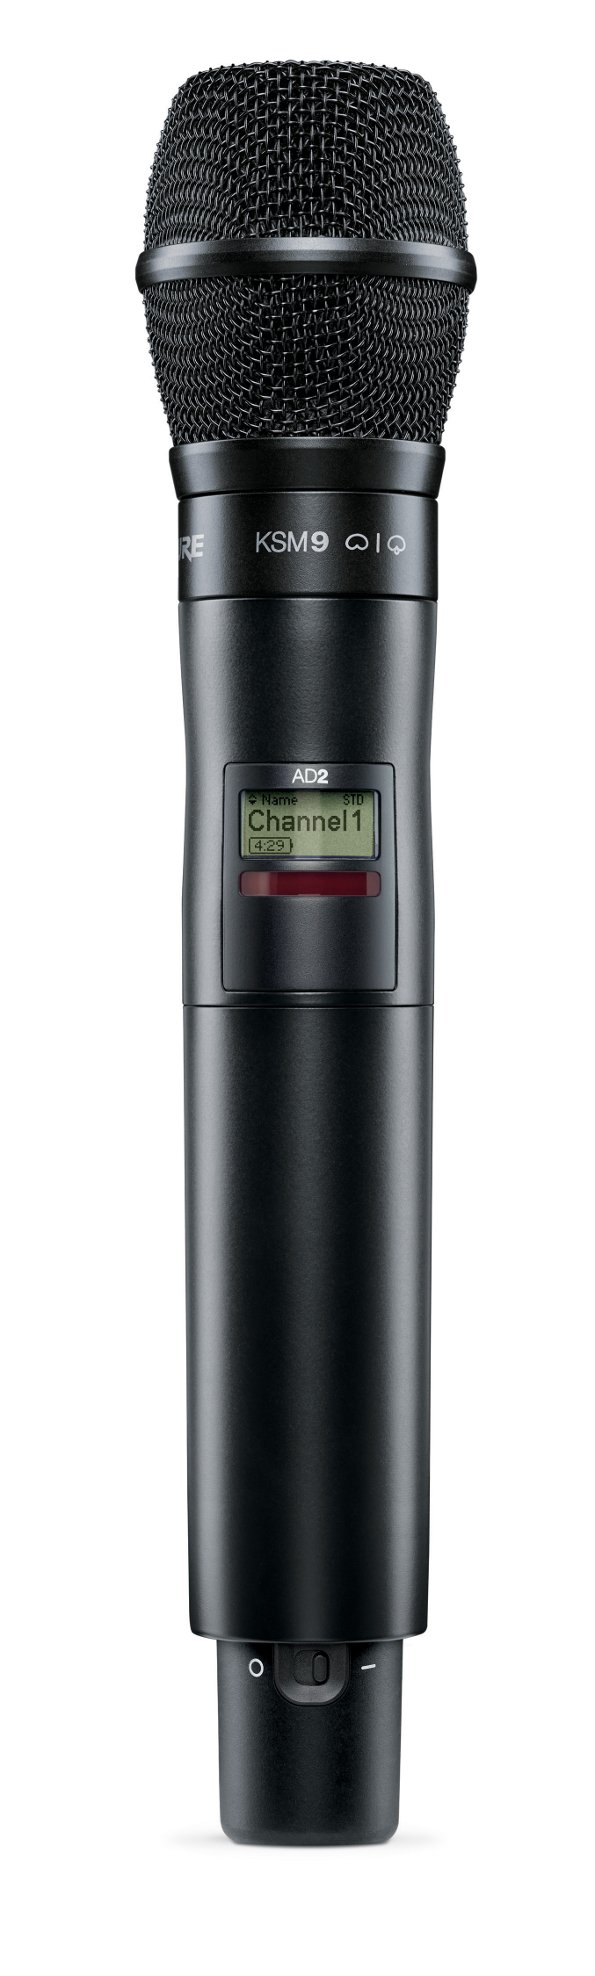 Axient Digital Handheld Transmitter with KSM9 Capsule in Black